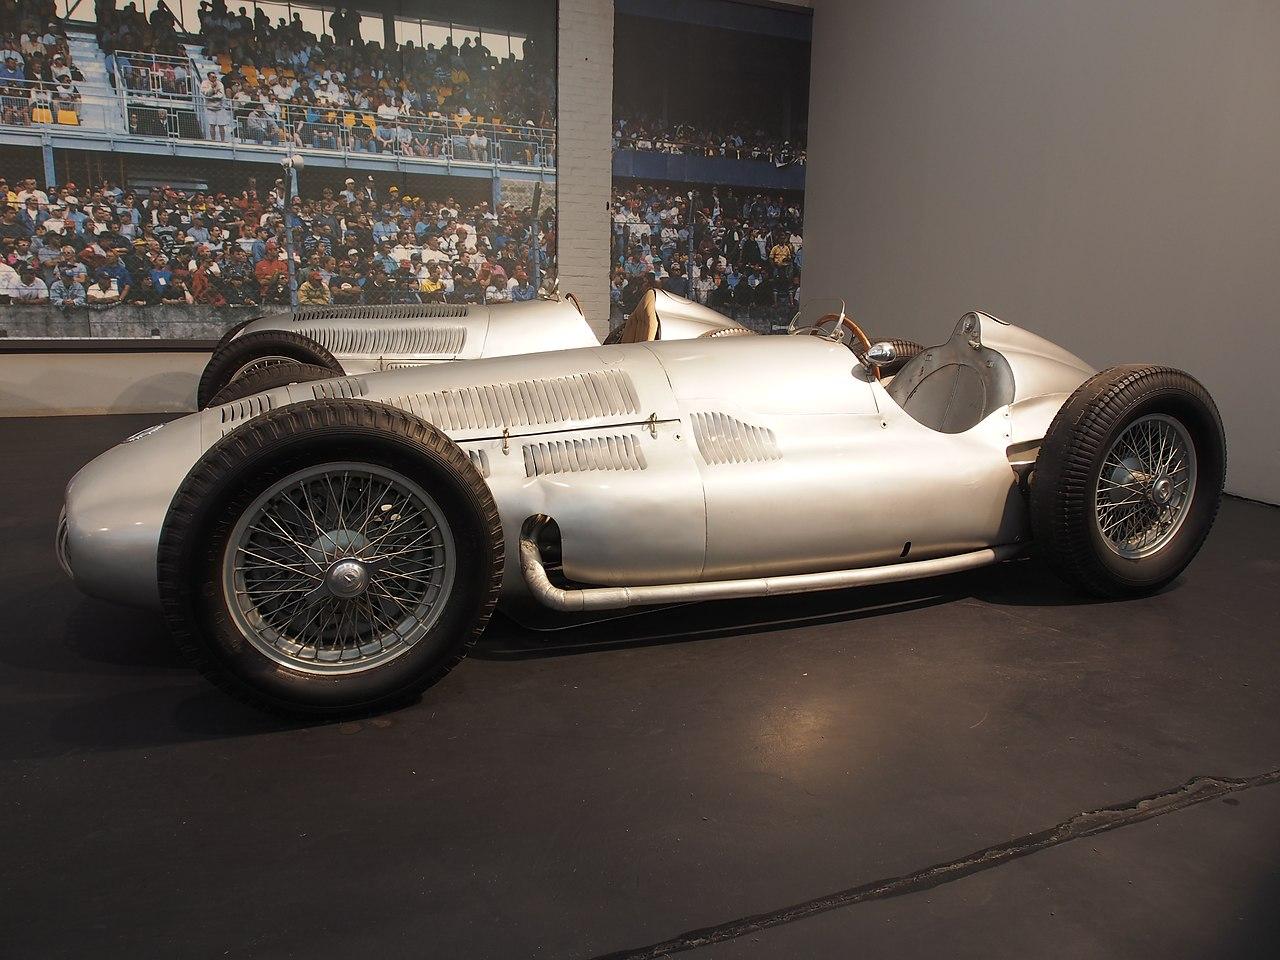 Mercedes Benz Van >> File:1939 Mercedes-Benz W154 Grand Prix, 12 cylinders ...